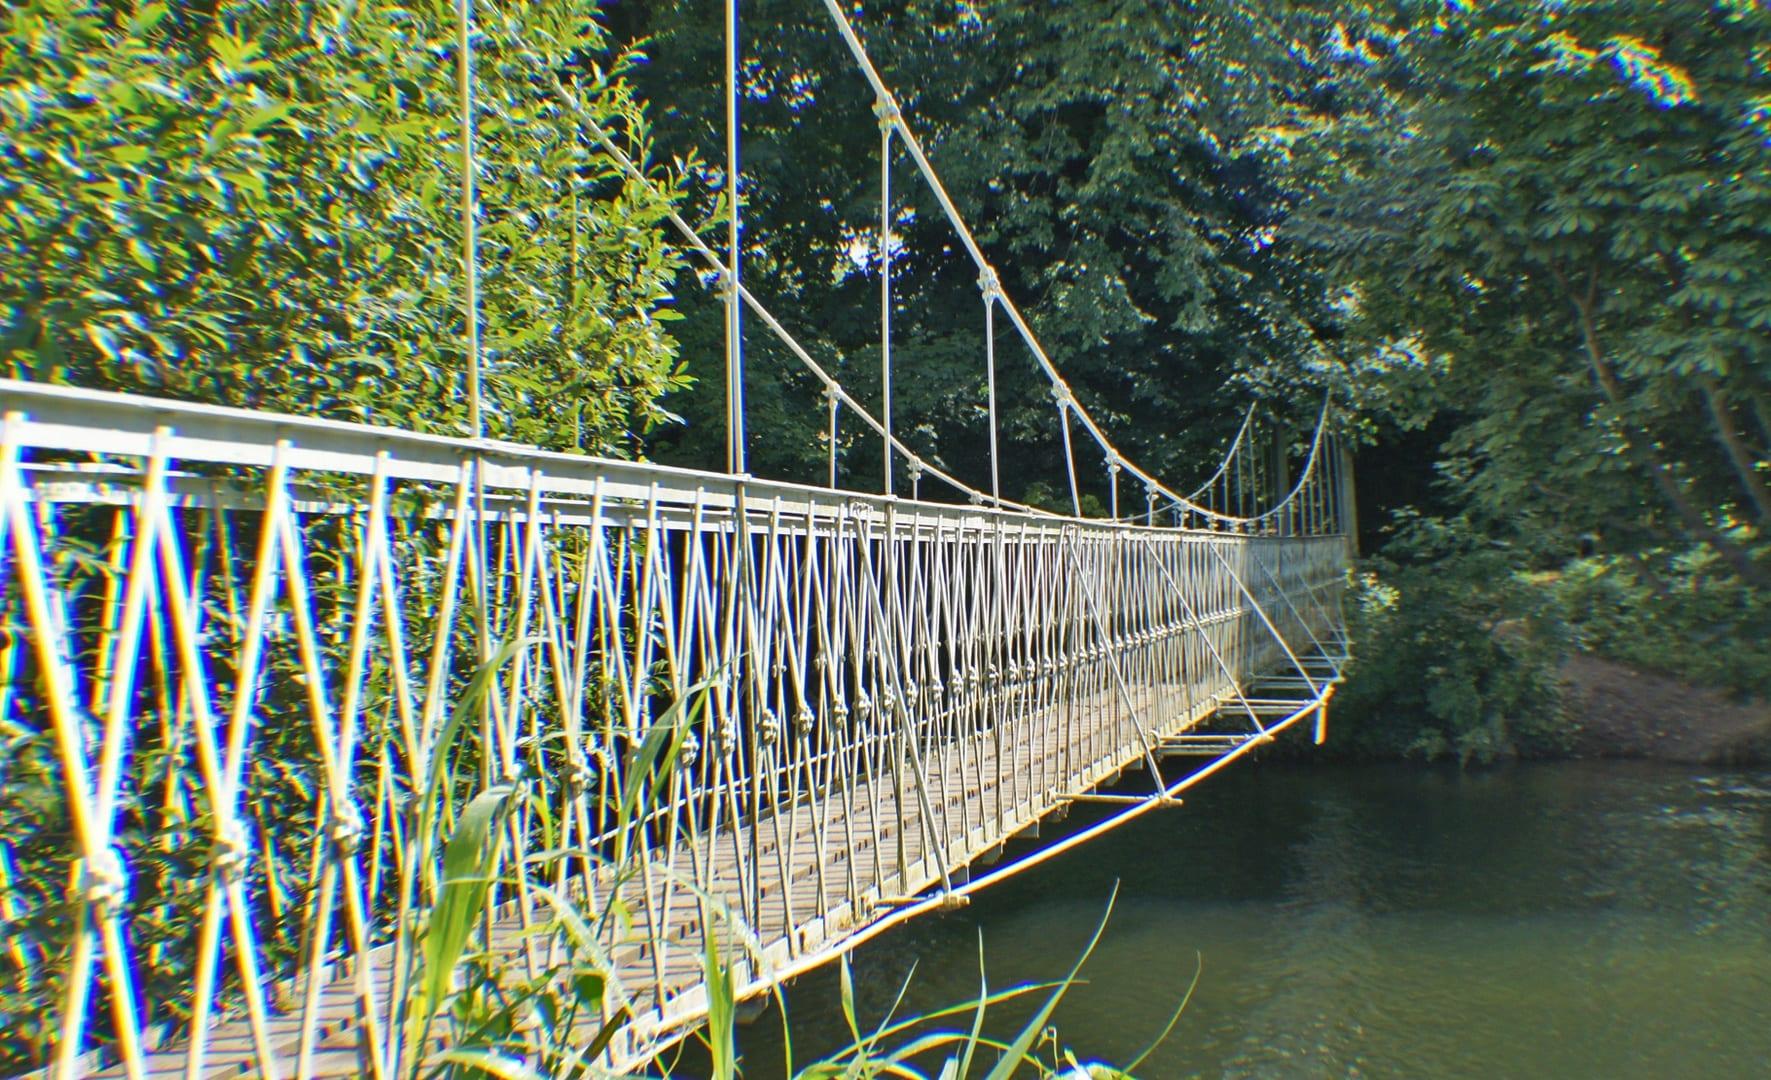 Pedestrian bridge across the River Stour